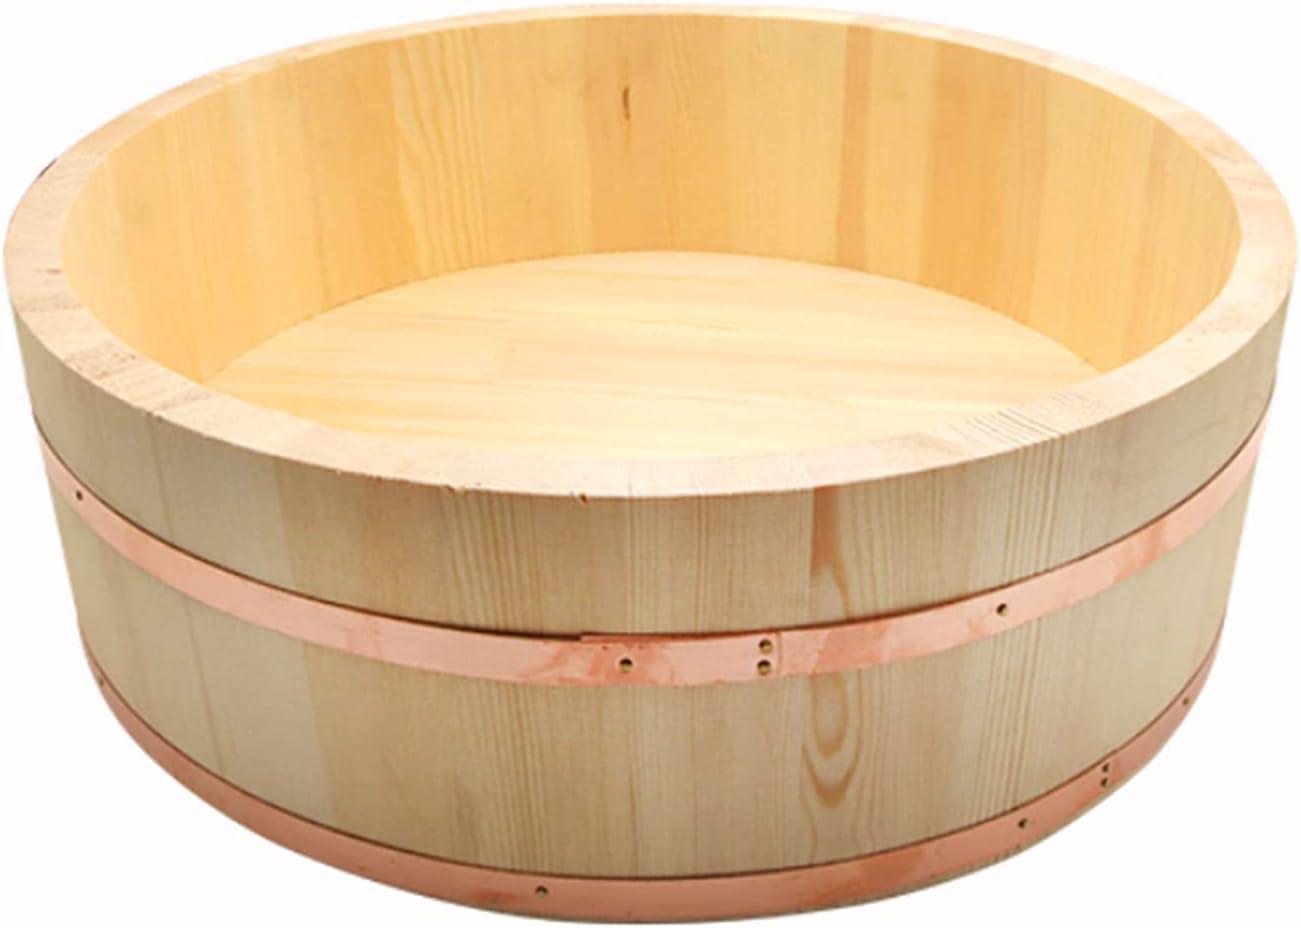 KELUNIS Wood Sushi Oke Max Directly managed store 83% OFF Tub Hangiri Copper Rice Mixing Bowl with